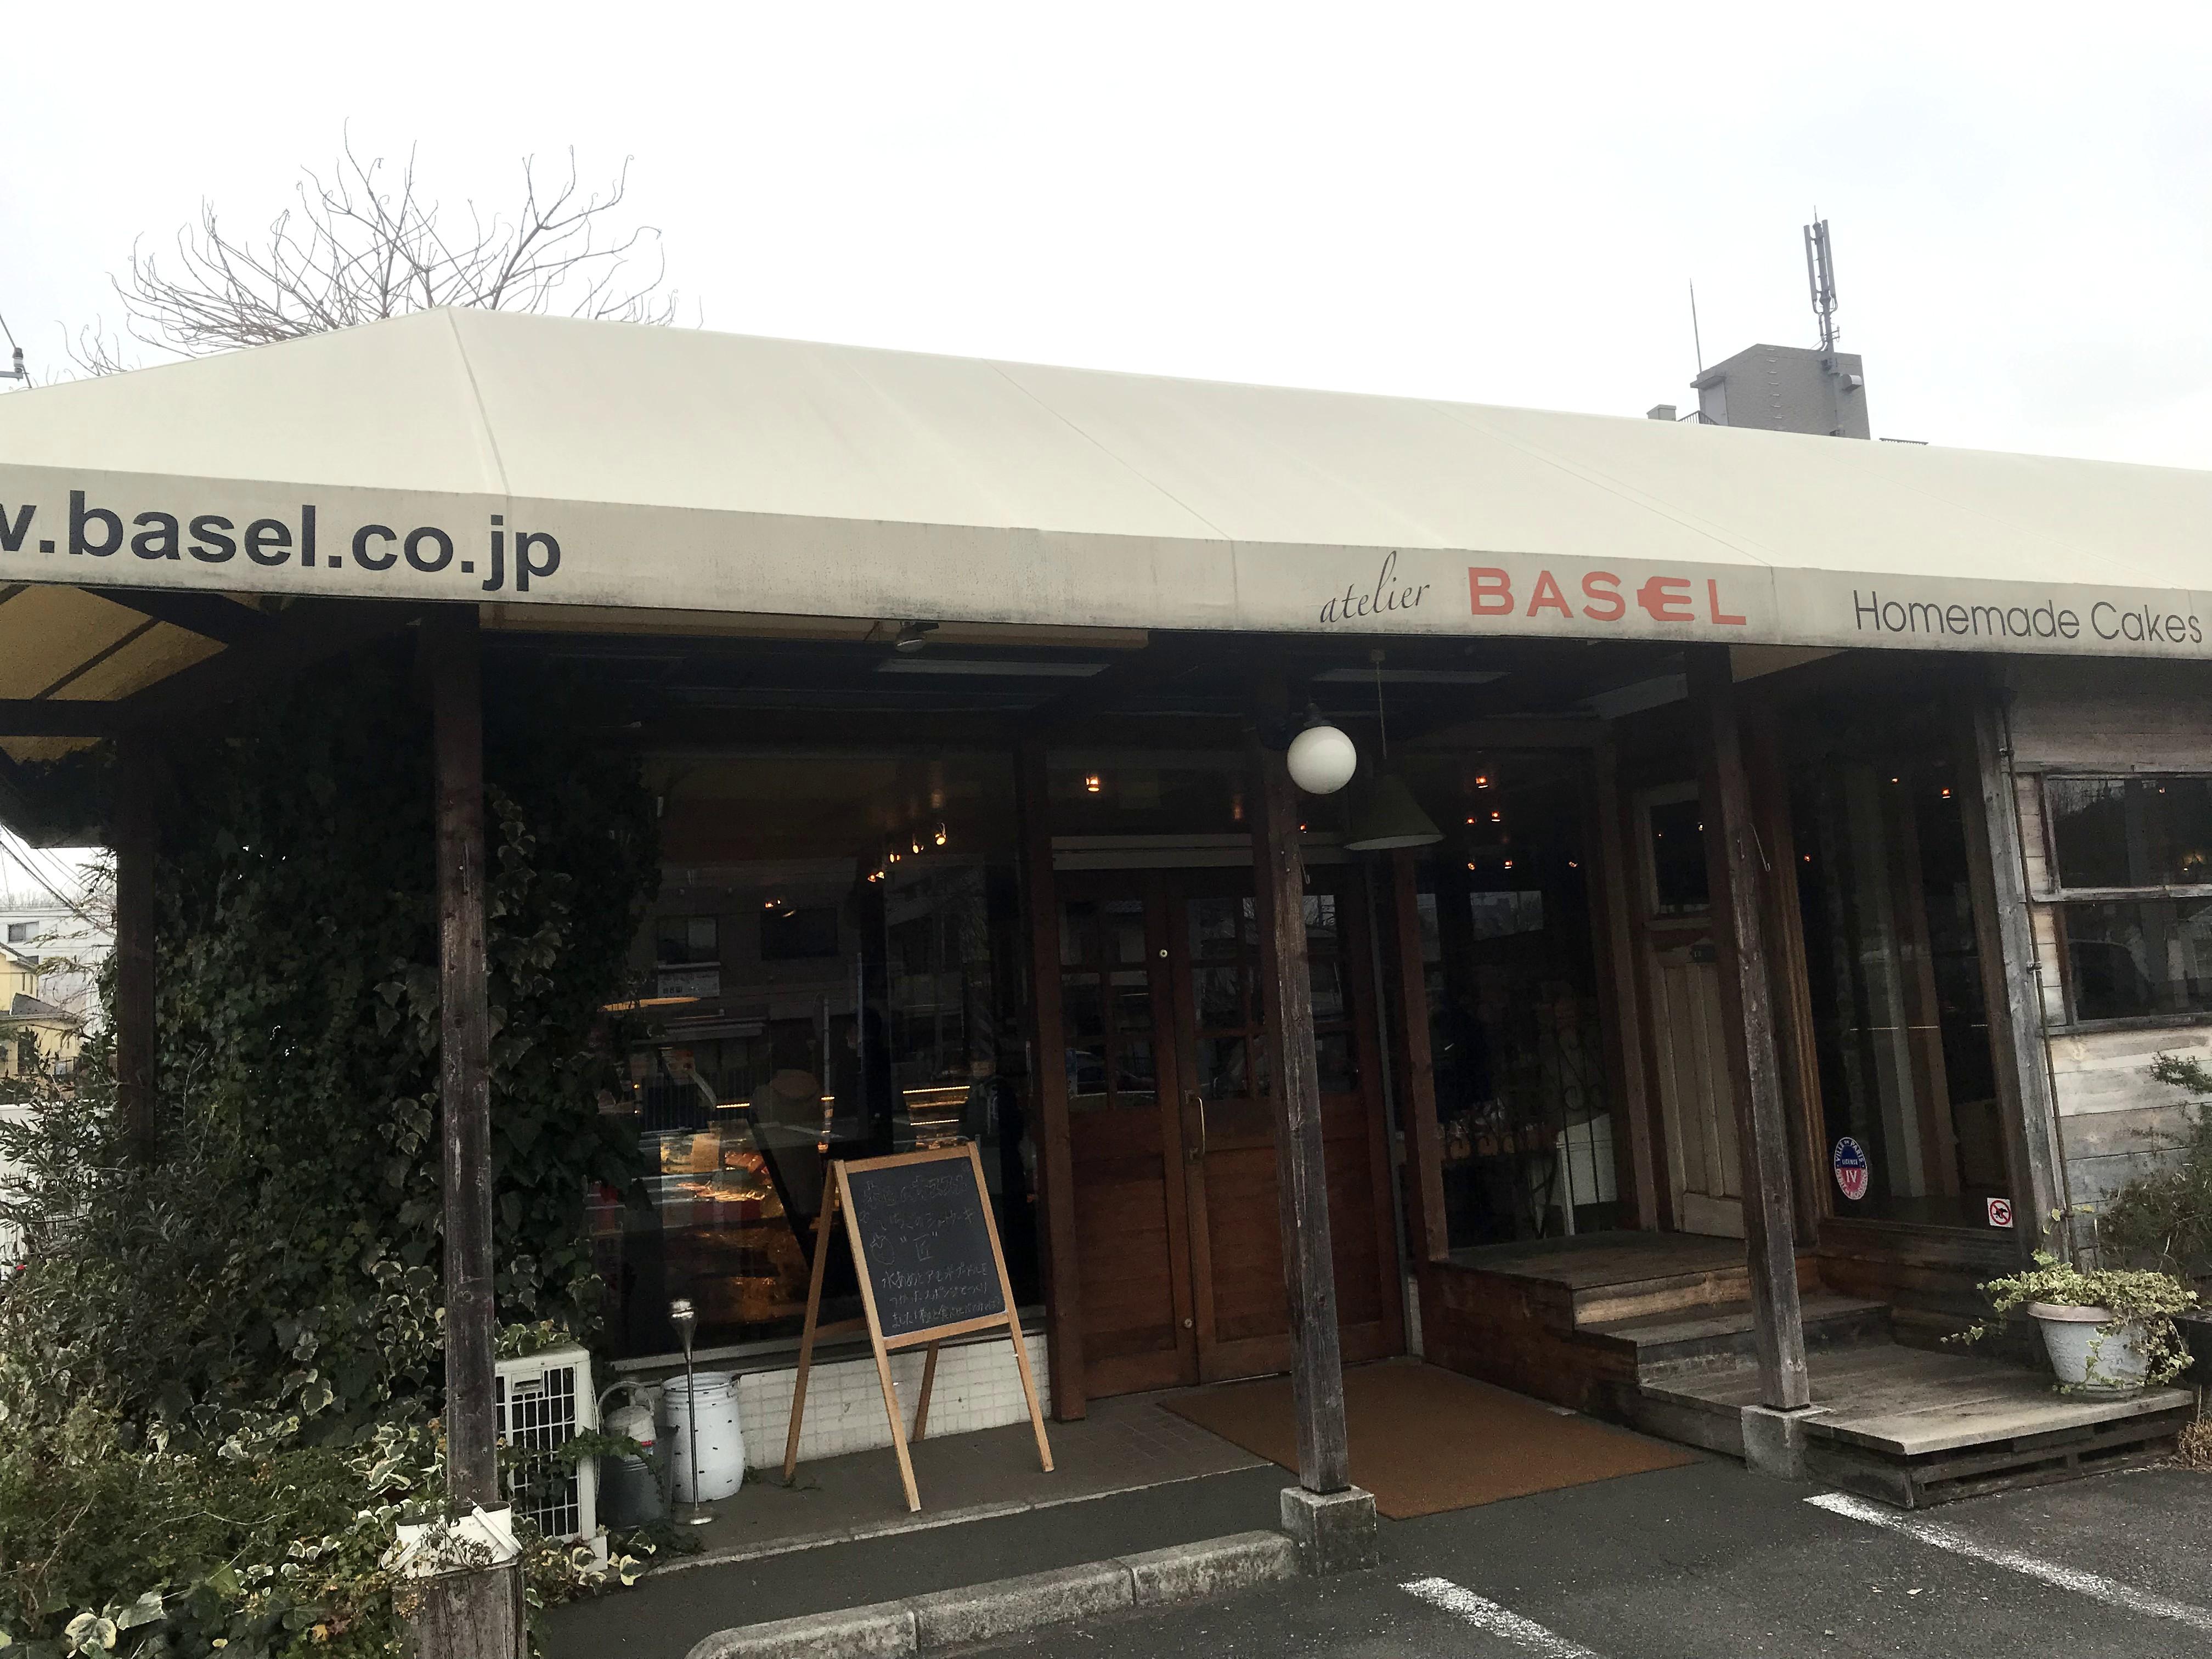 atelier BASEL (アトリエ・バーゼル)